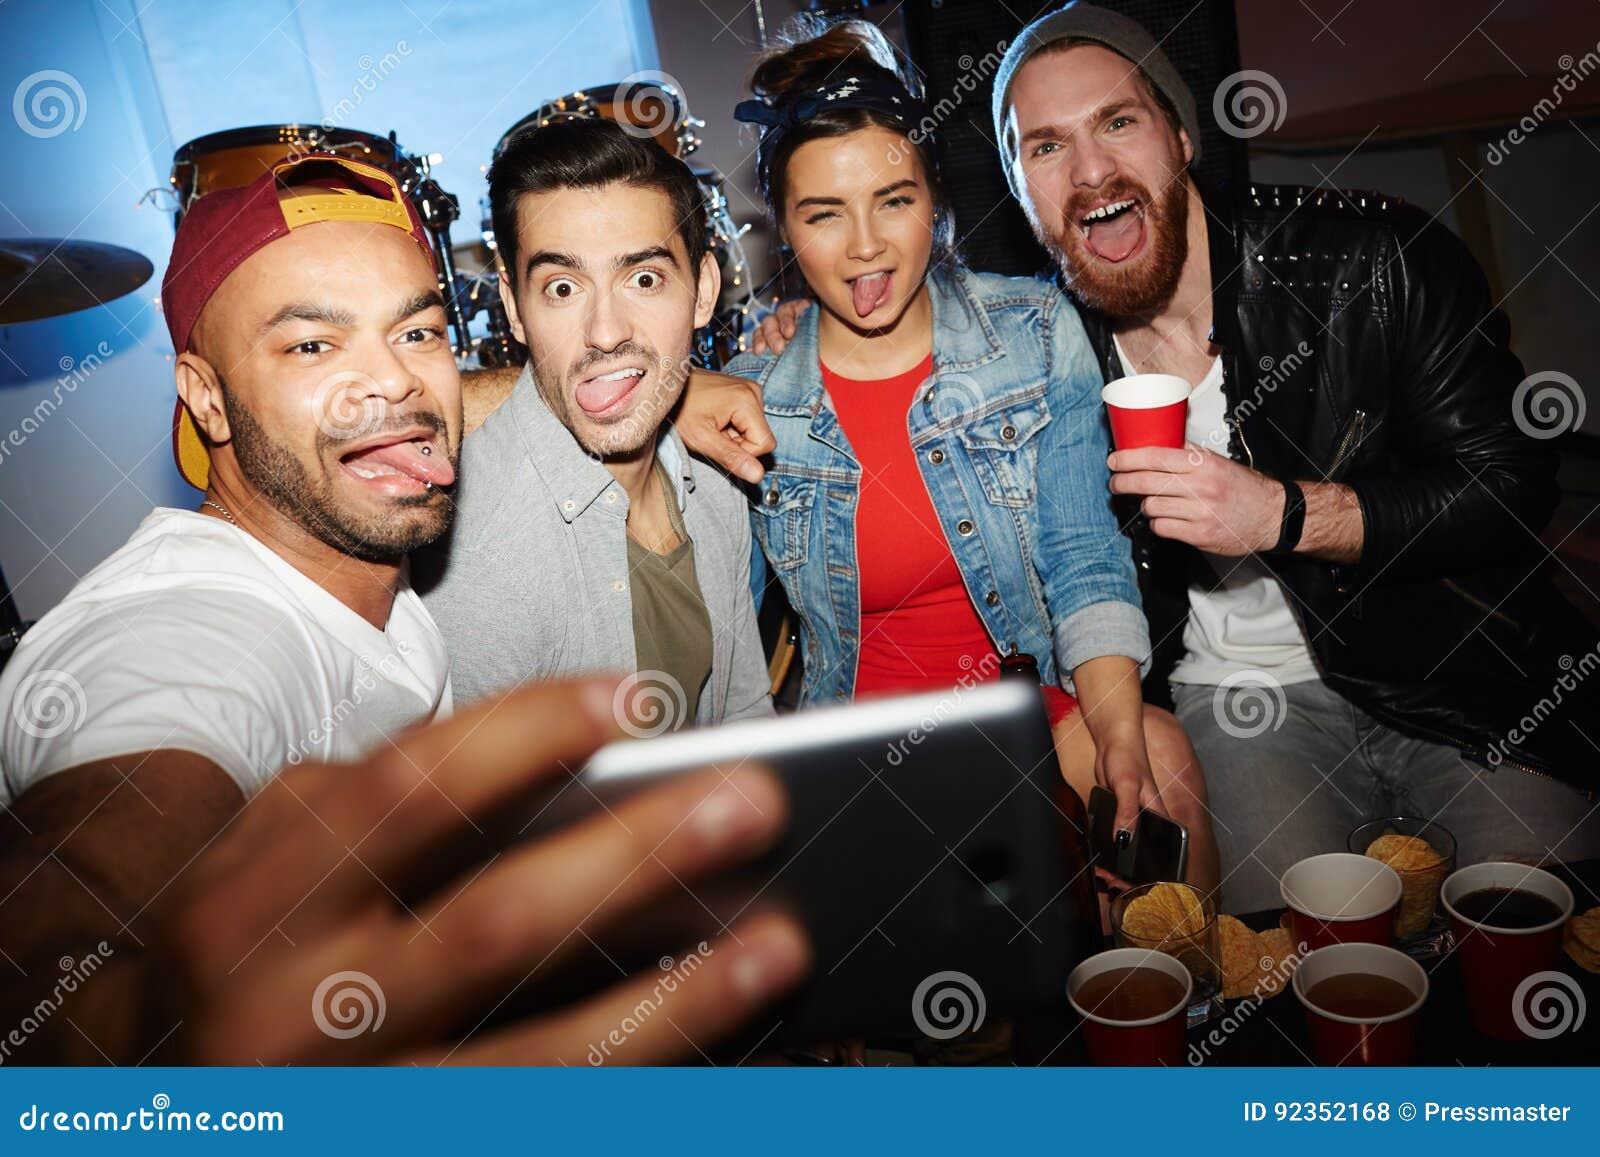 Download 采取疯狂的Selfie的朋友在令人敬畏的夜总会党 库存照片. 图片 包括有 现代, 夜总会, 招待, 做鬼脸 - 92352168